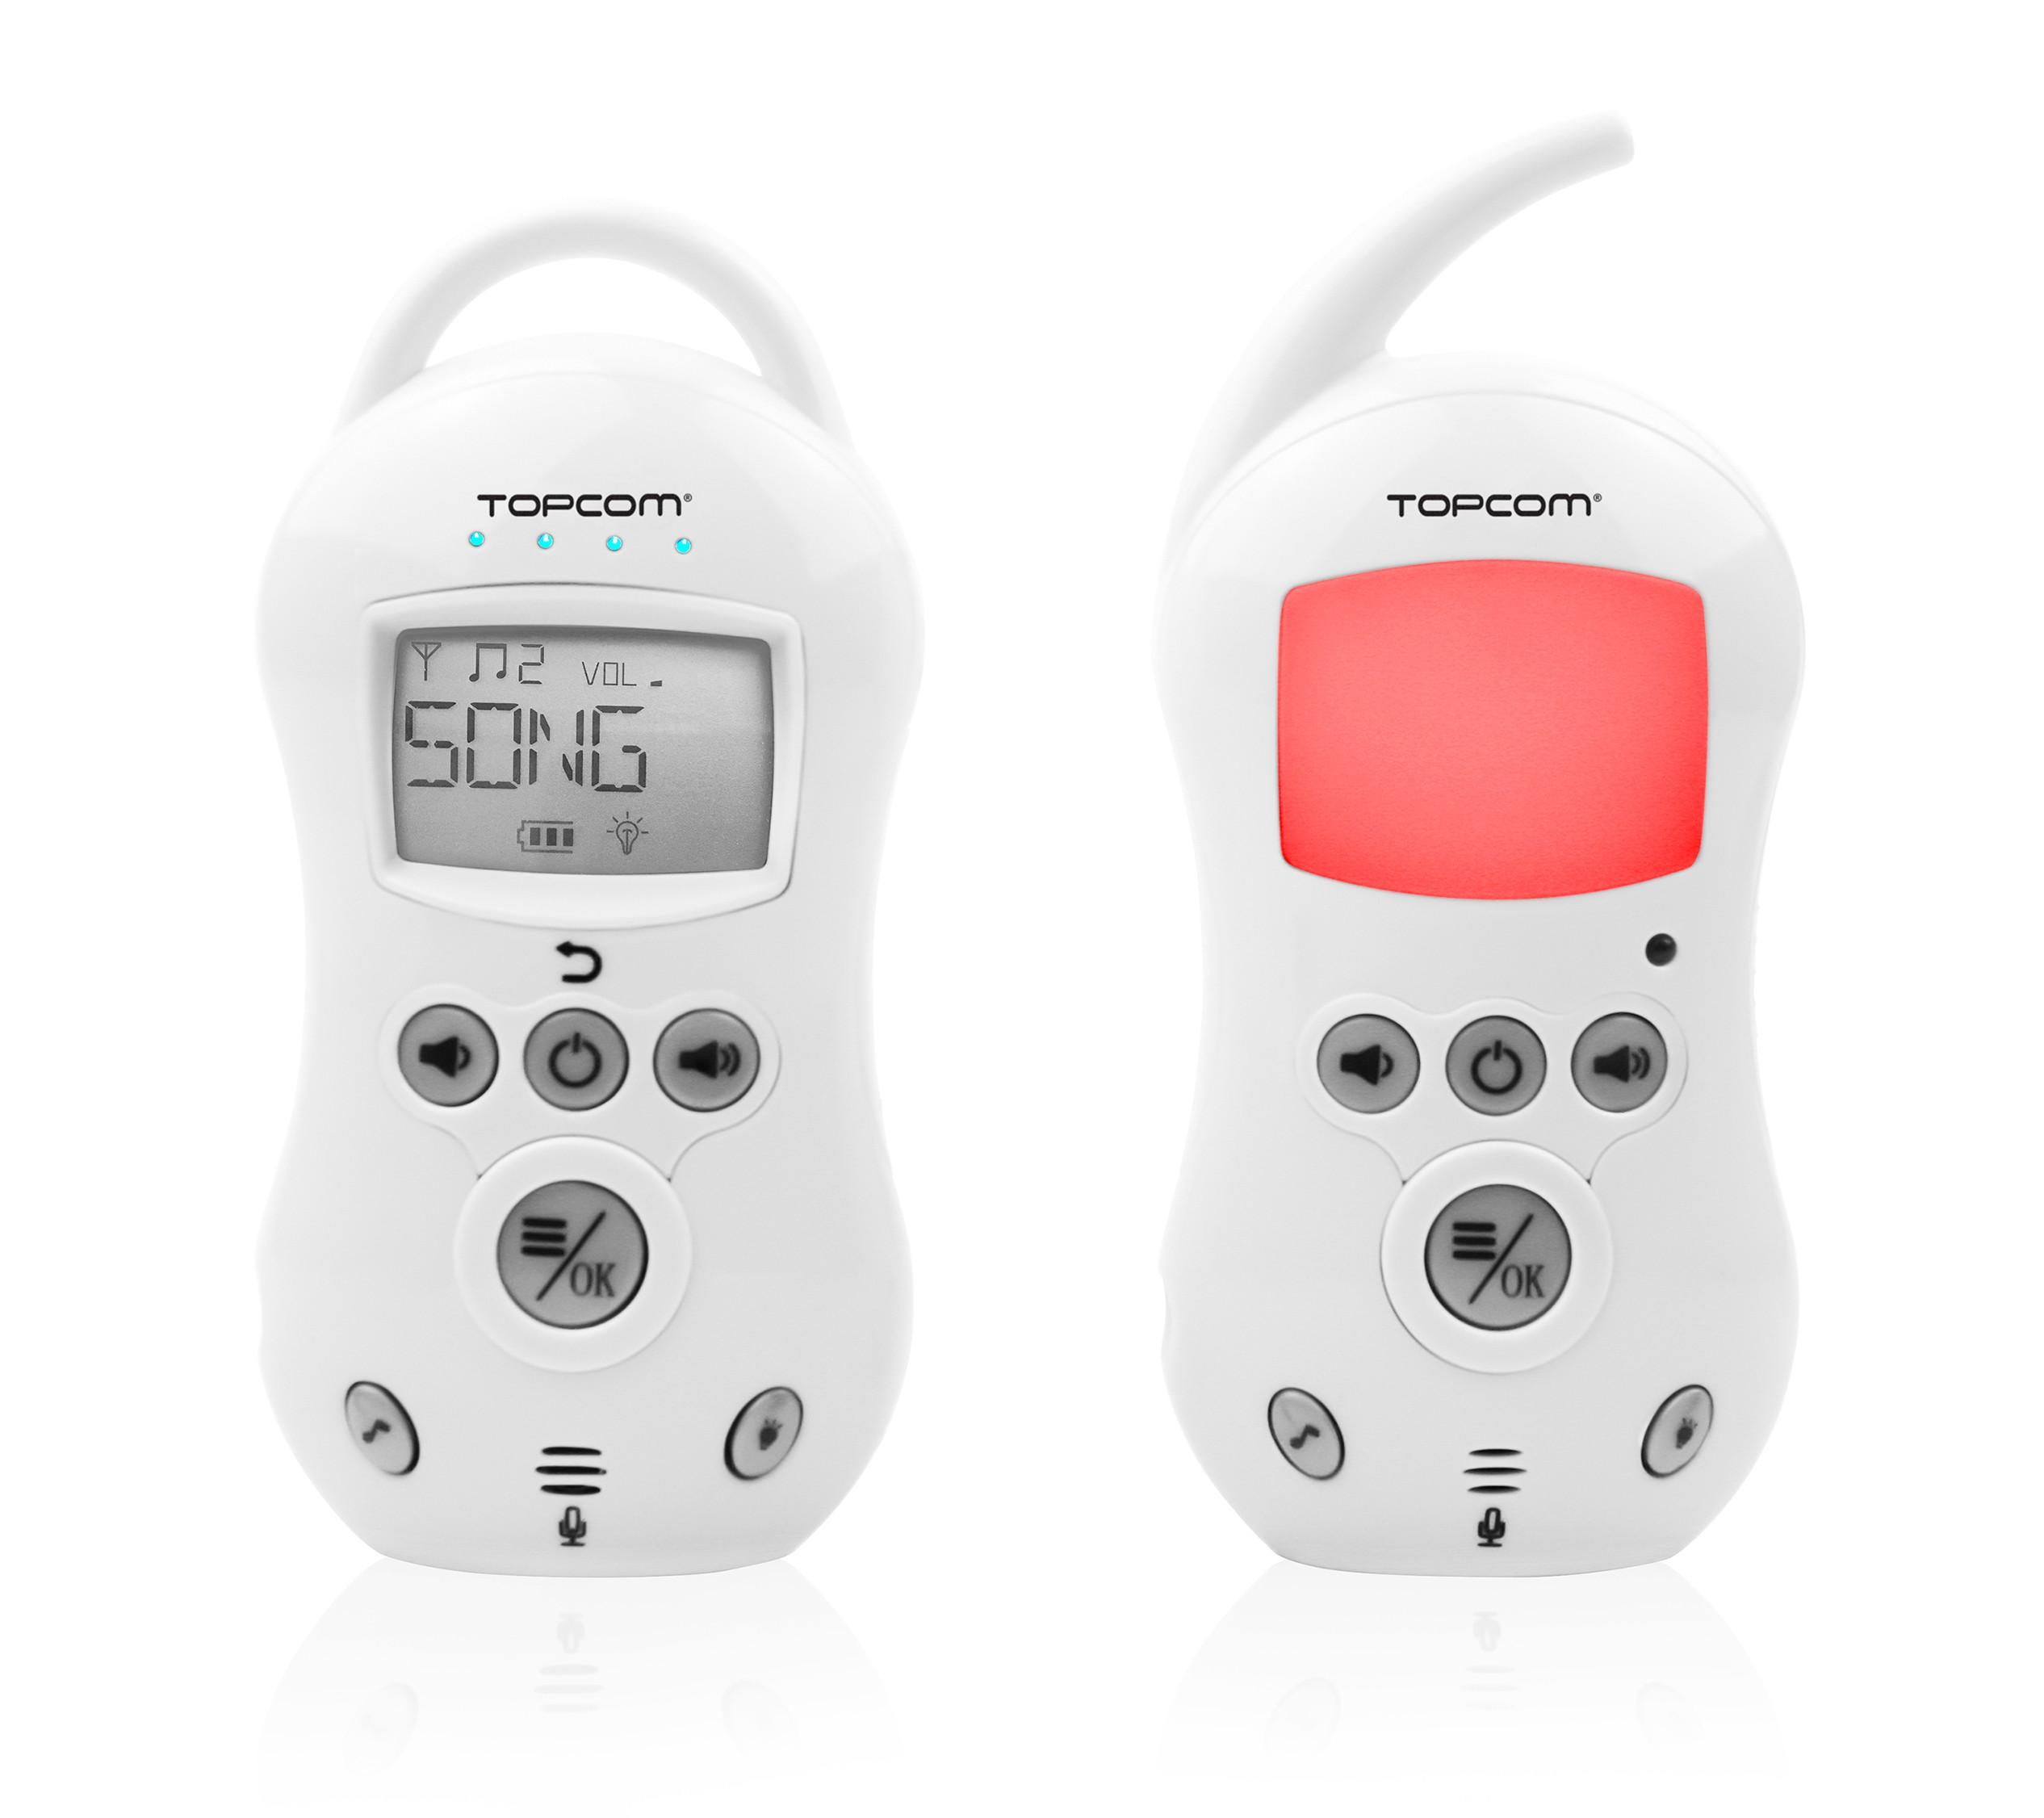 babyphone topcom ks 4222 1 8ghz reichweite 300m bei. Black Bedroom Furniture Sets. Home Design Ideas